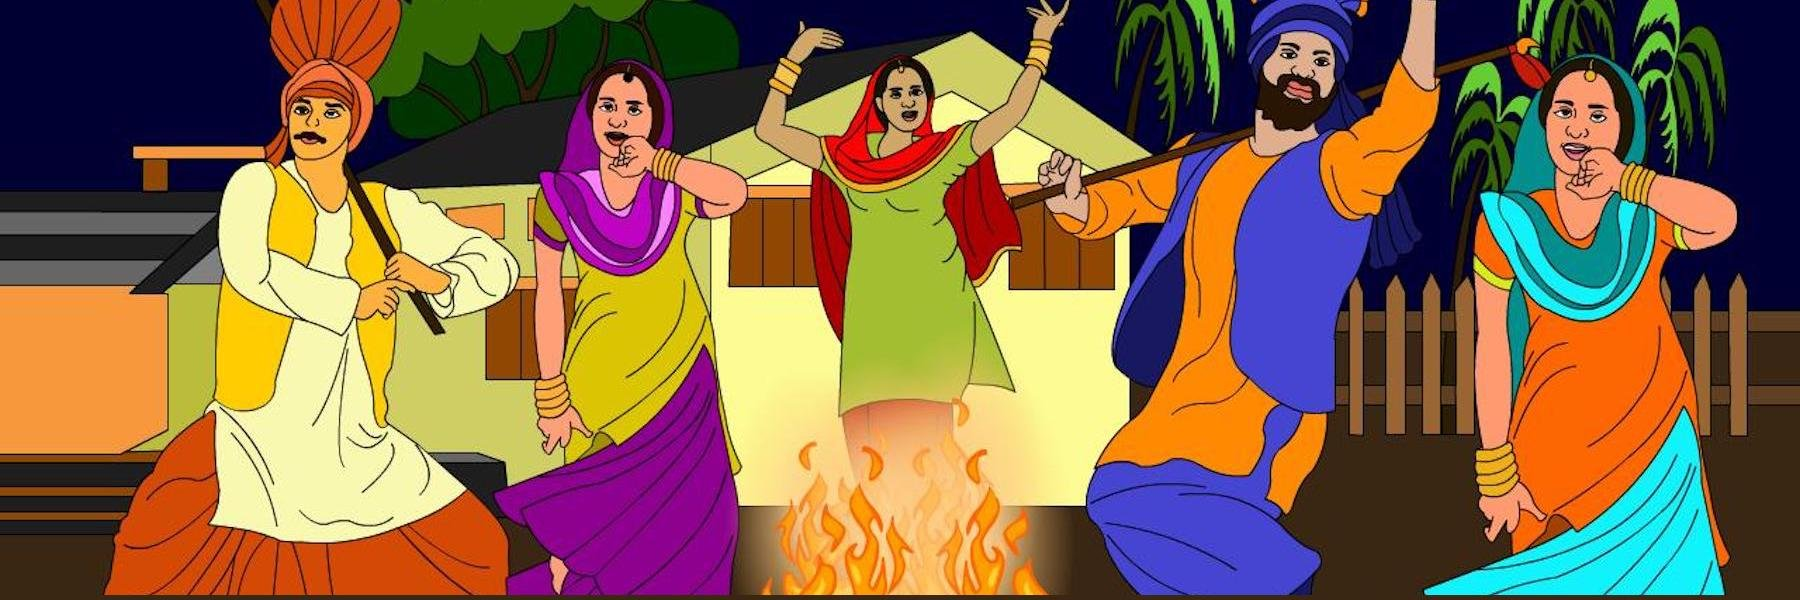 Wishing you a happy harvest season. Happy Lohri/Makar Sankranti/Pongal!